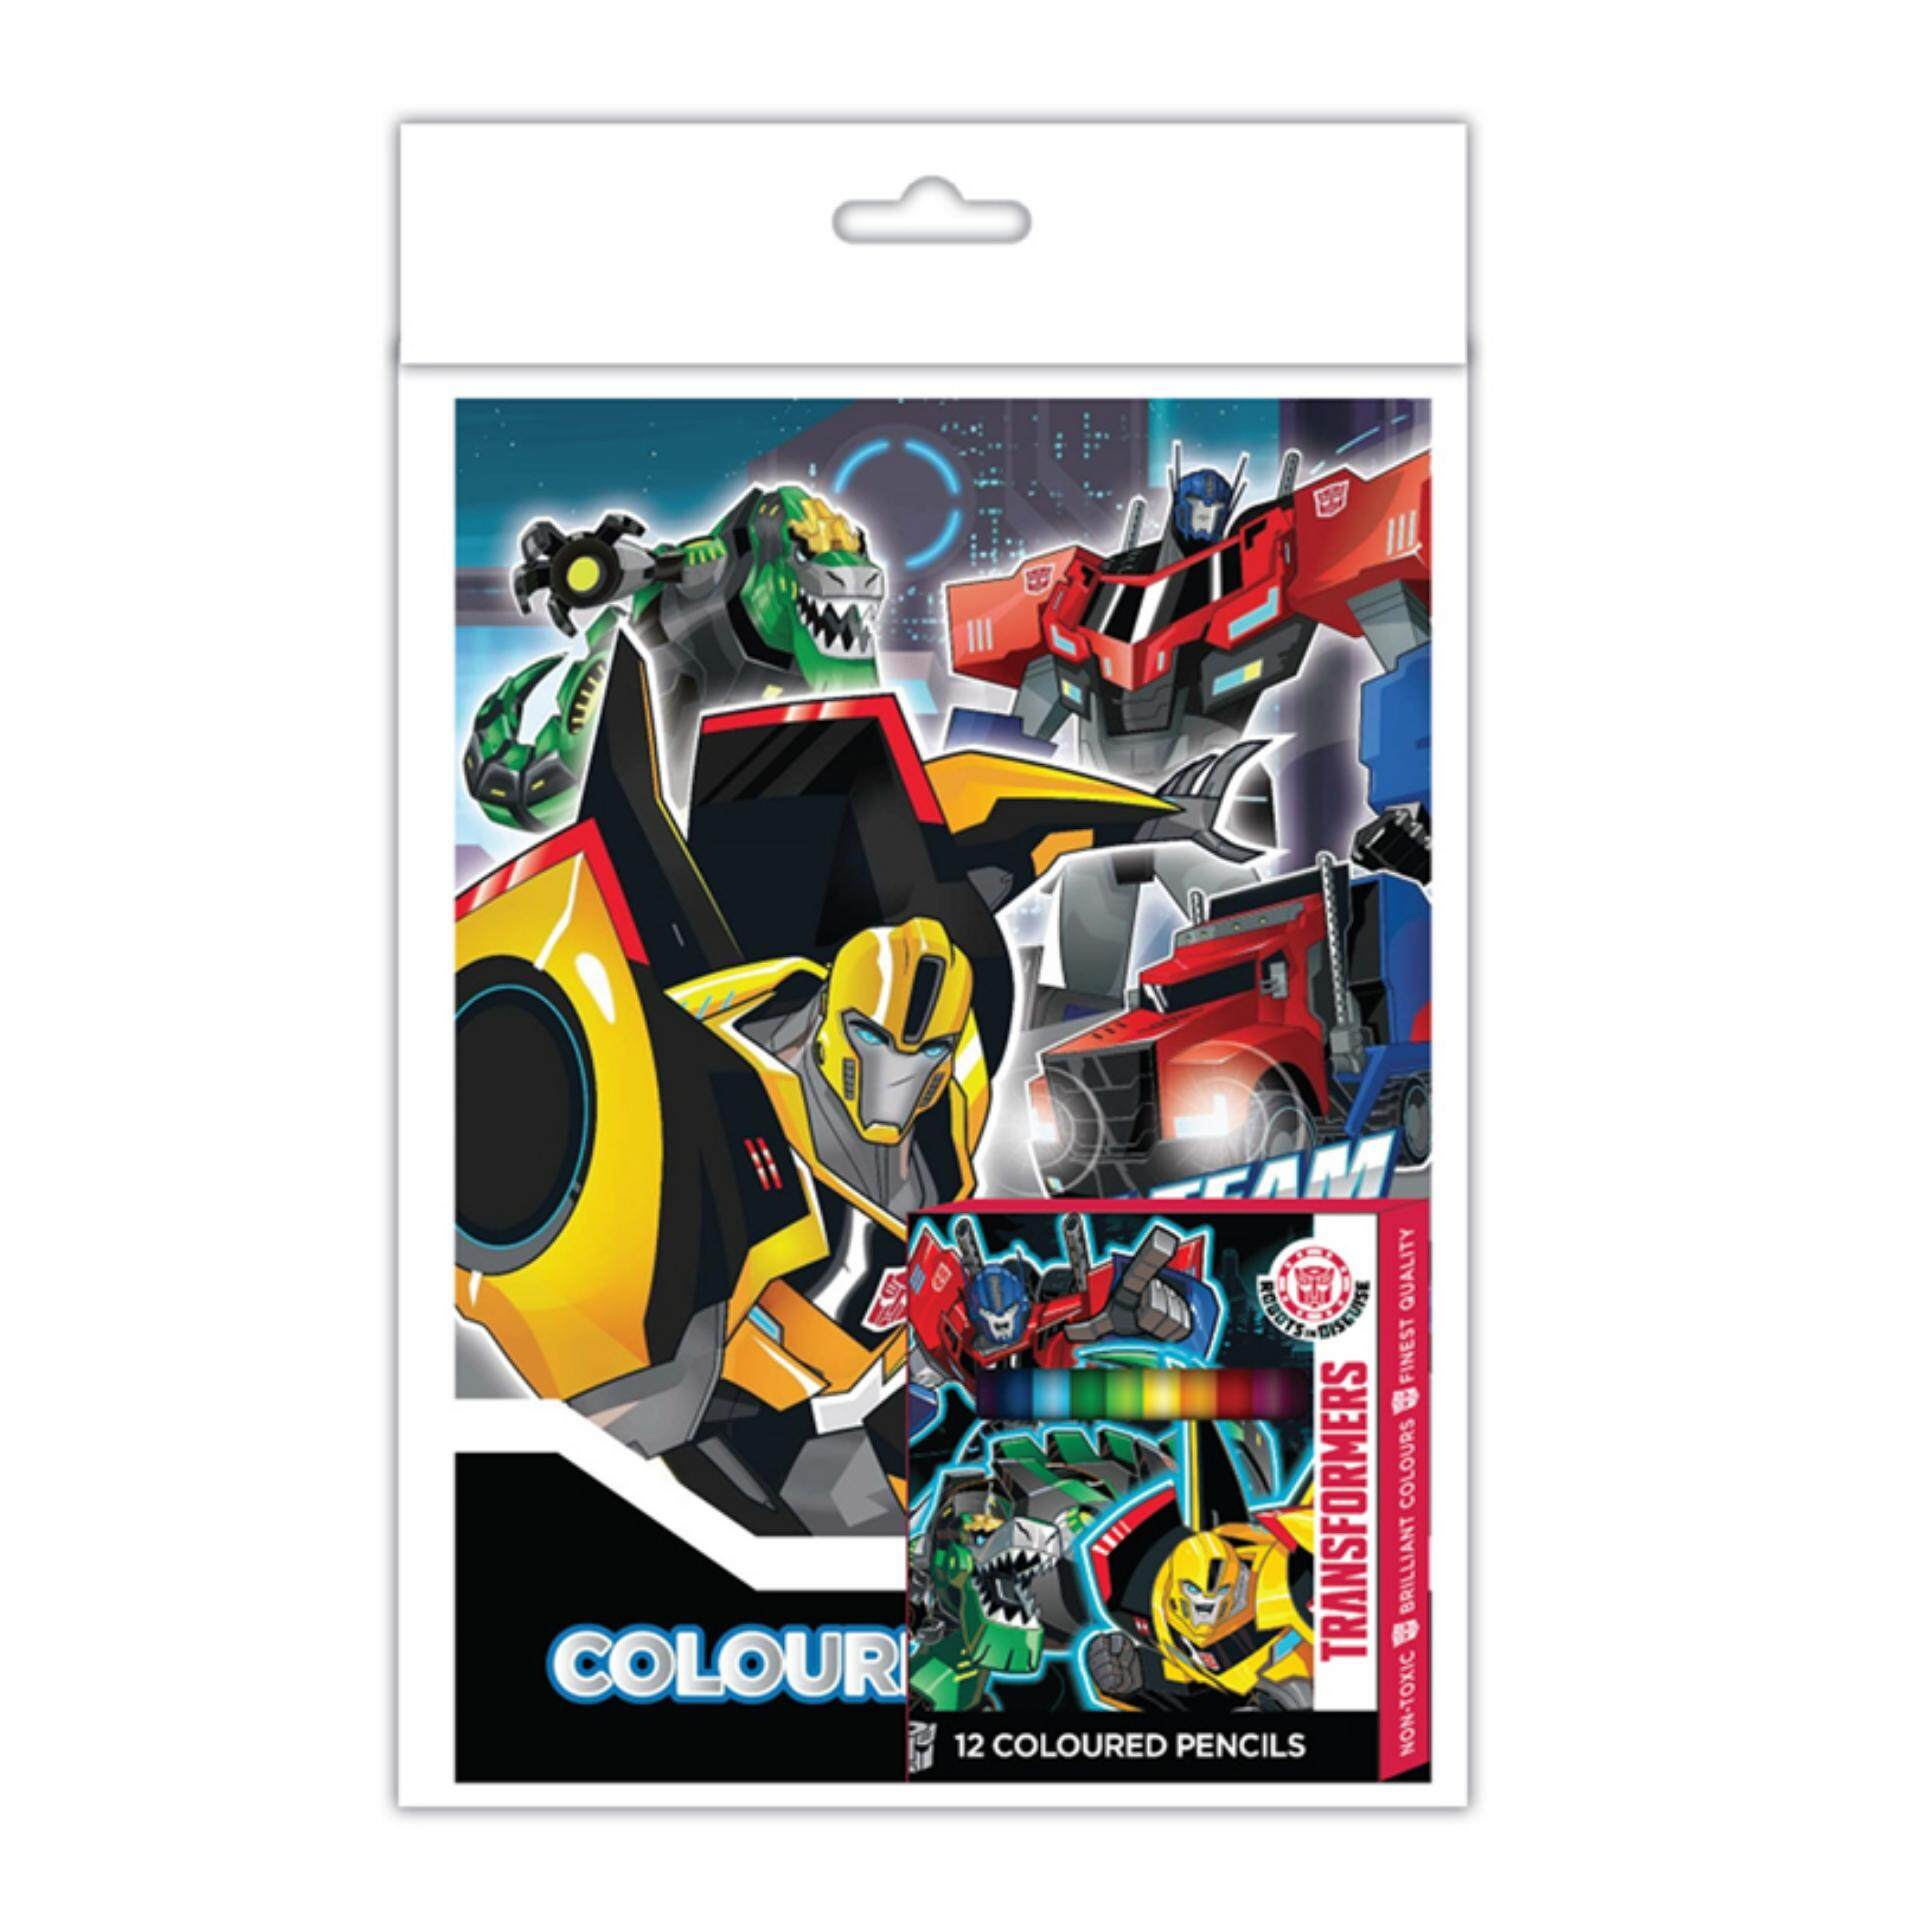 Transformers Activity Book With Colour Pencil Set - Multicolour